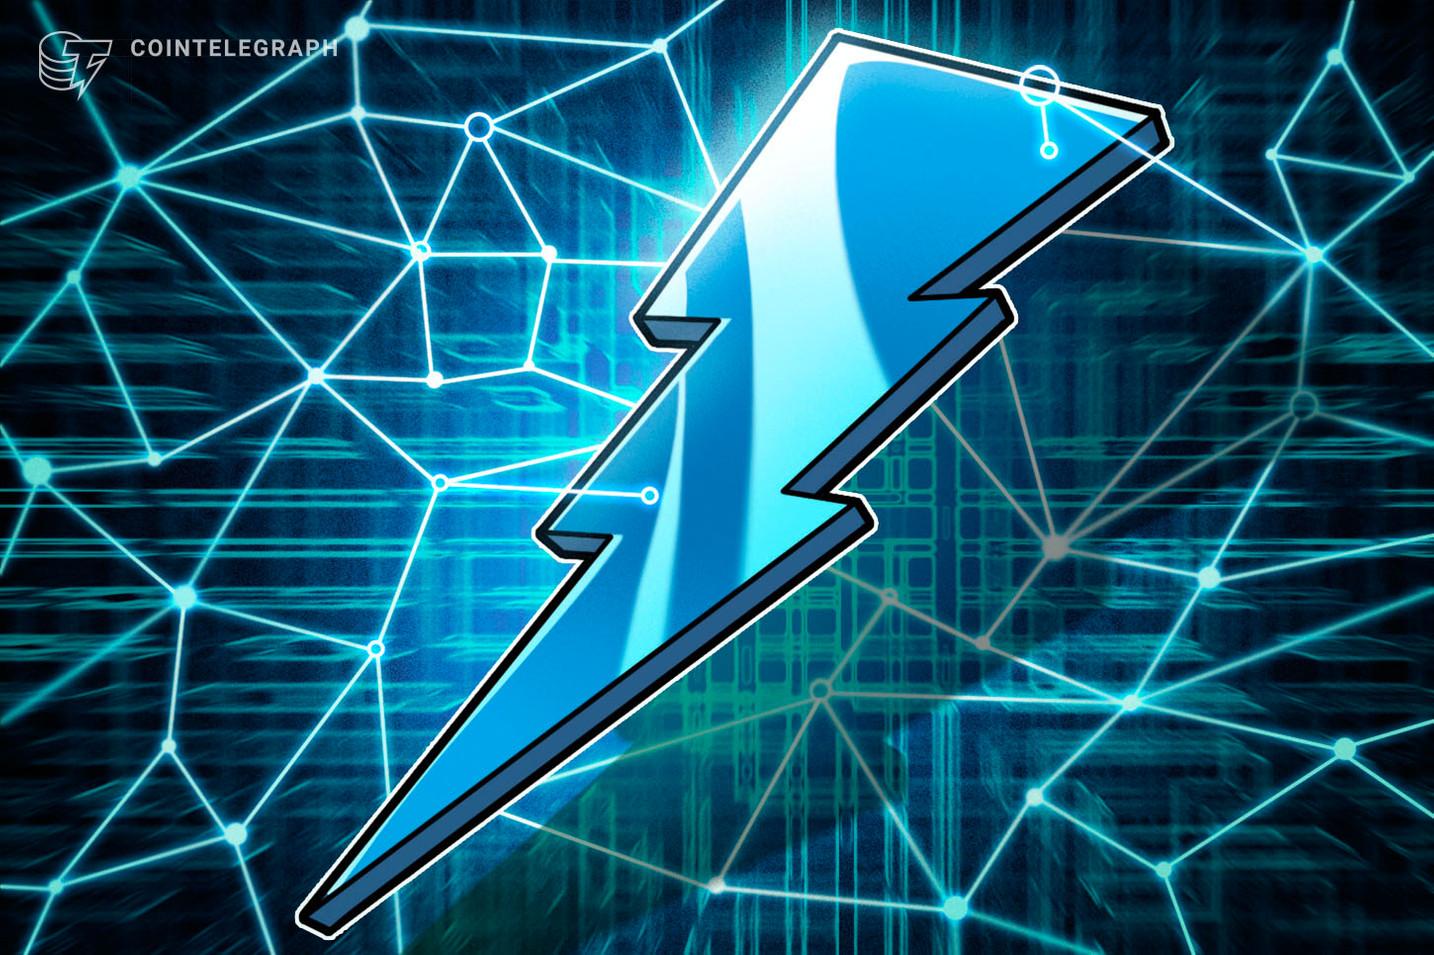 Energy Company E.ON Files Blockchain Patent for Data Analytics Device